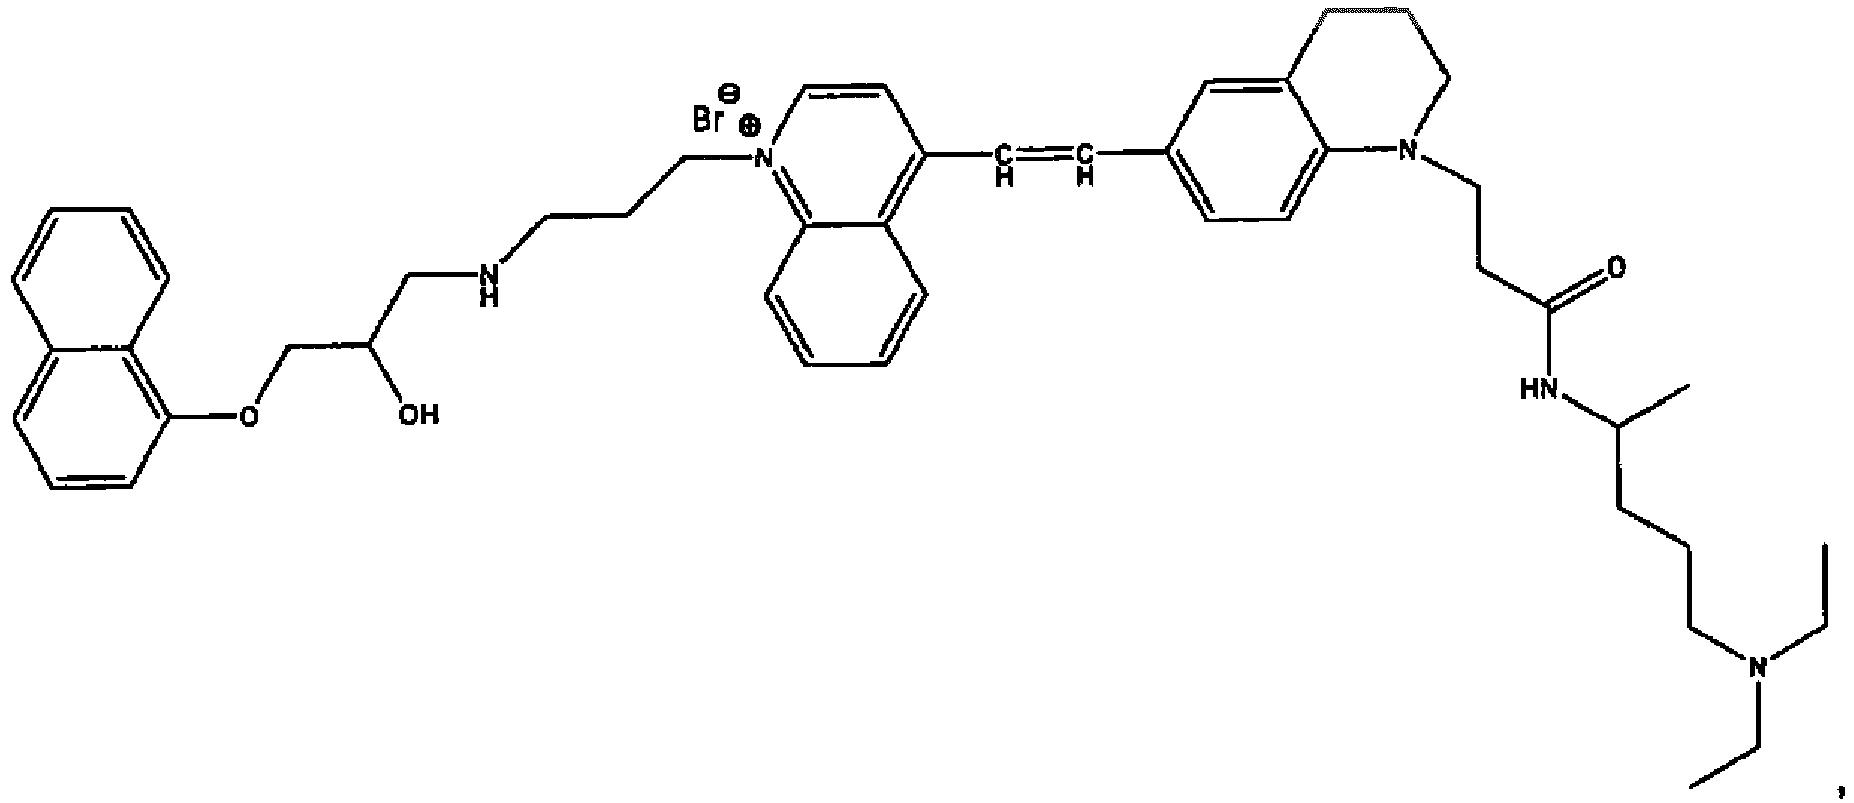 Figure imgb0173